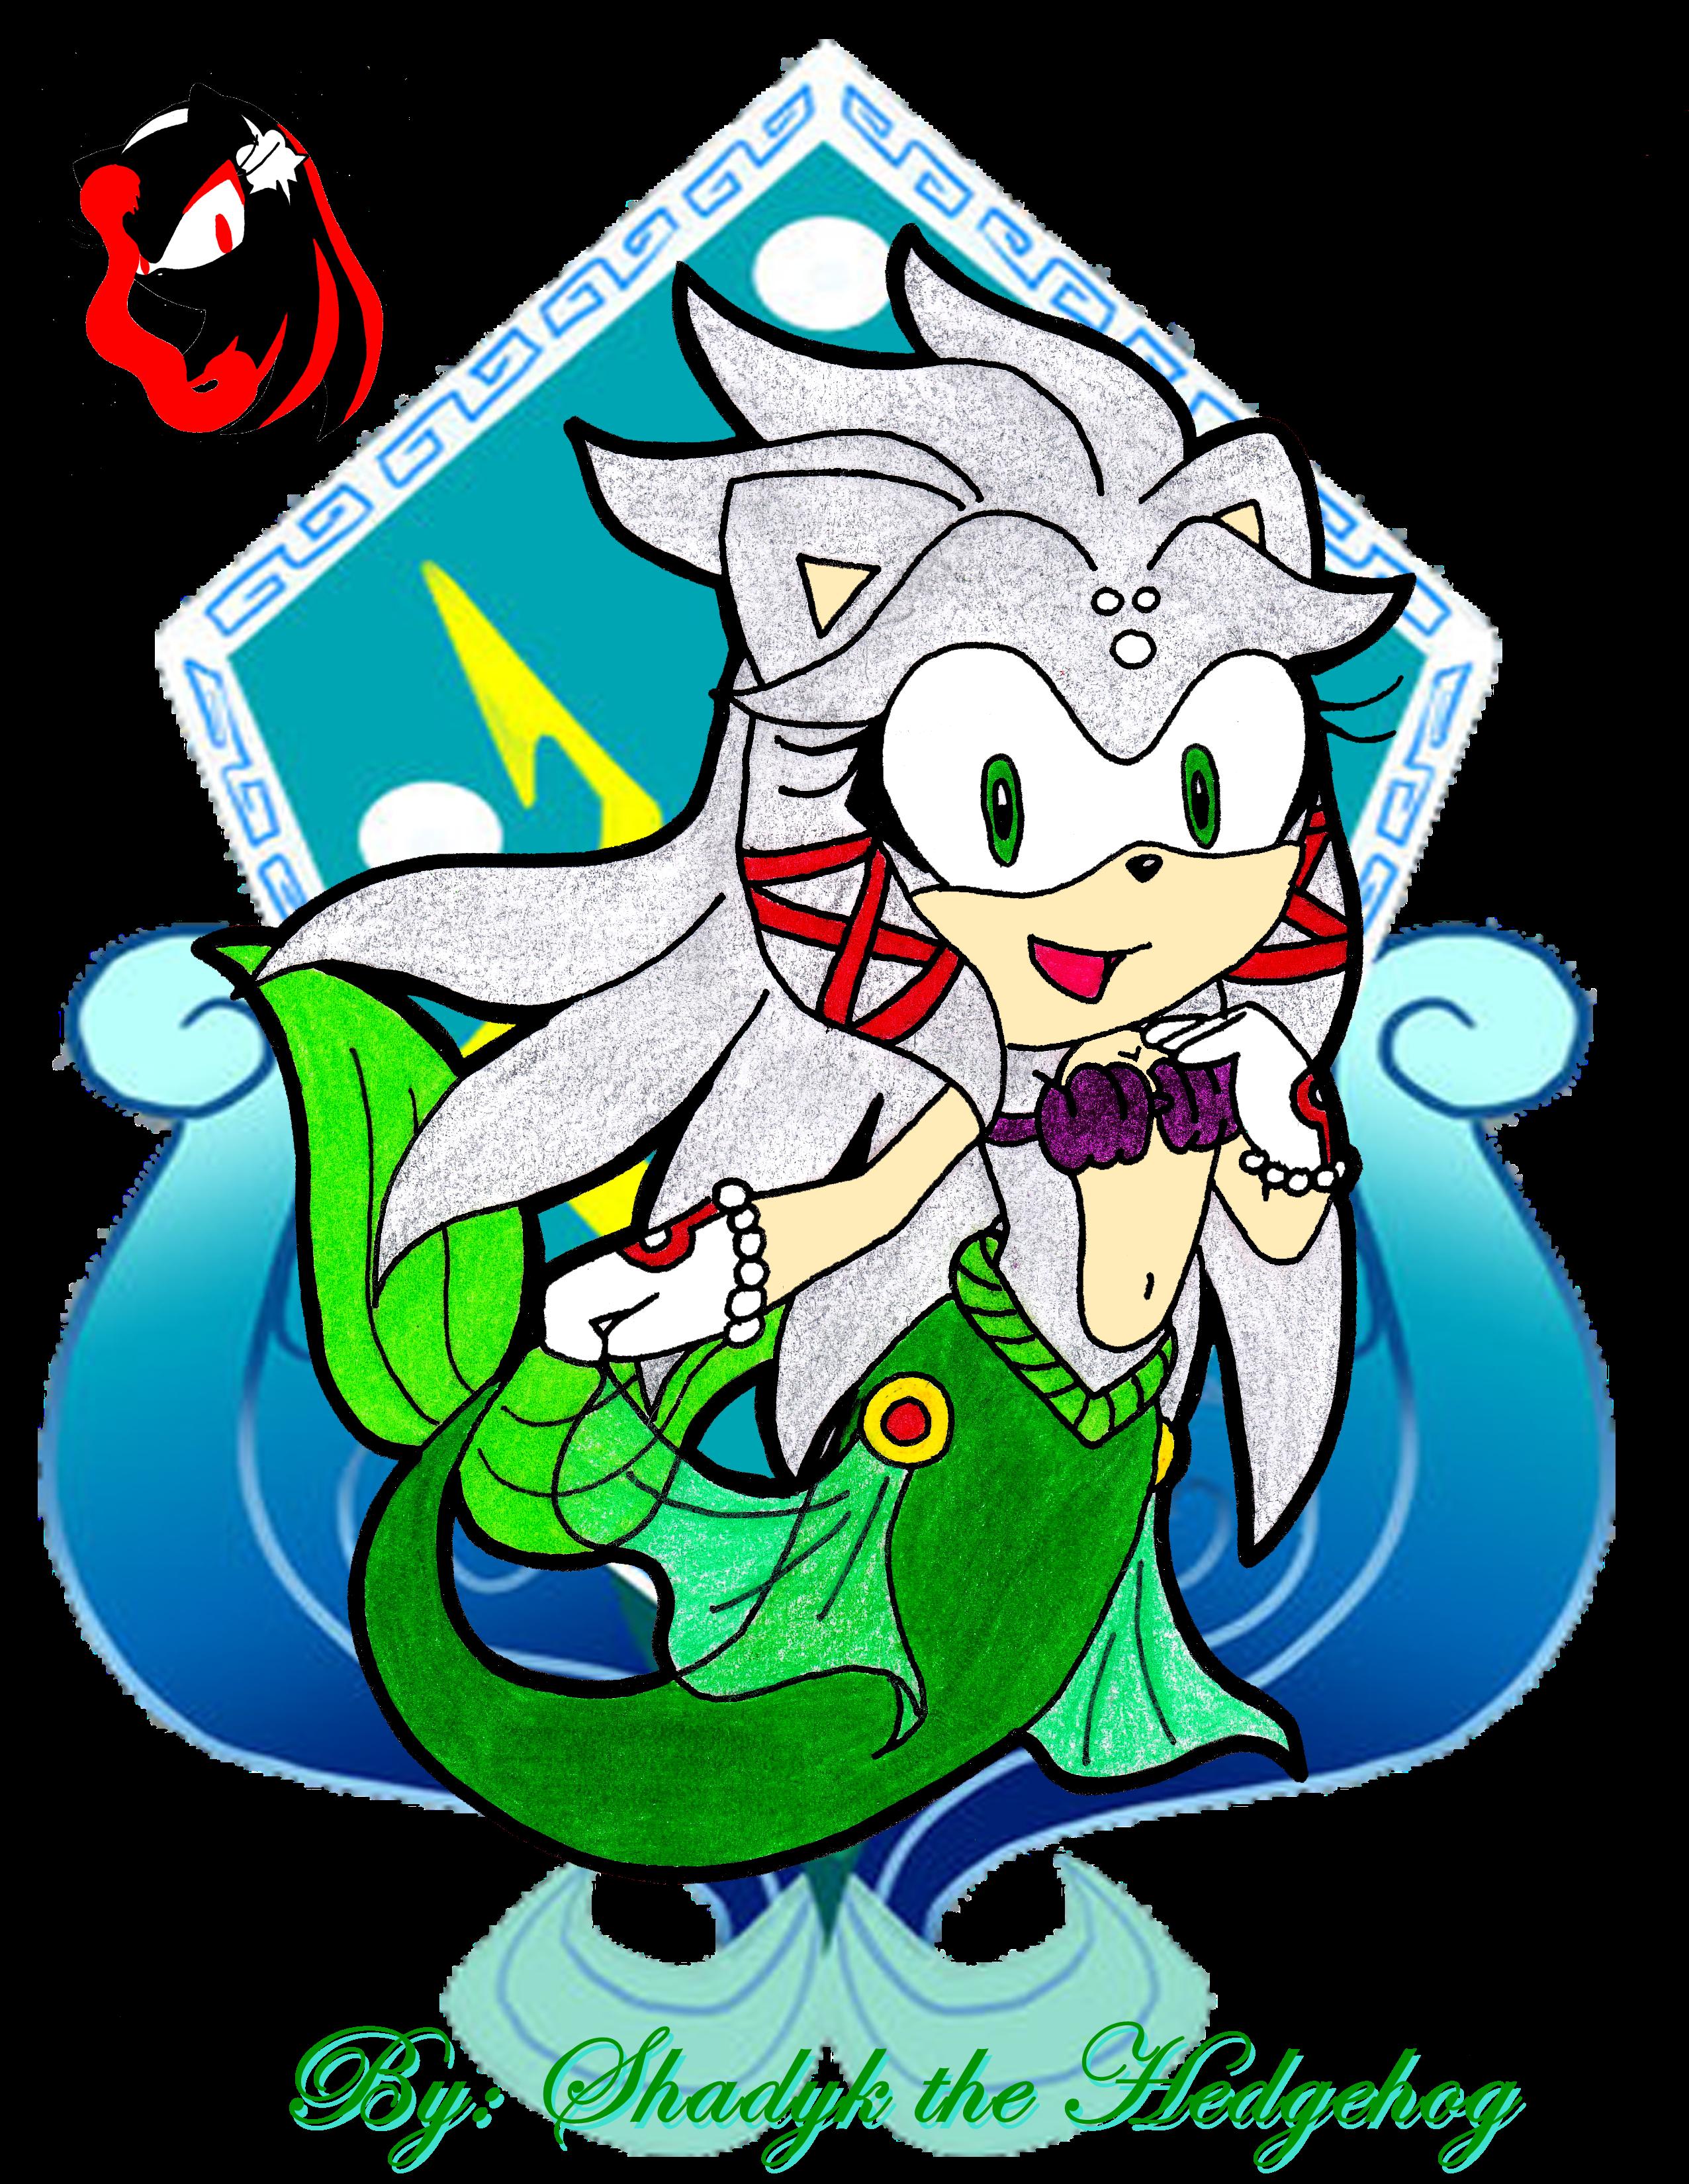 Princess Sapphire the Merhog Kingdom of Atlantis by PrincessShadyk